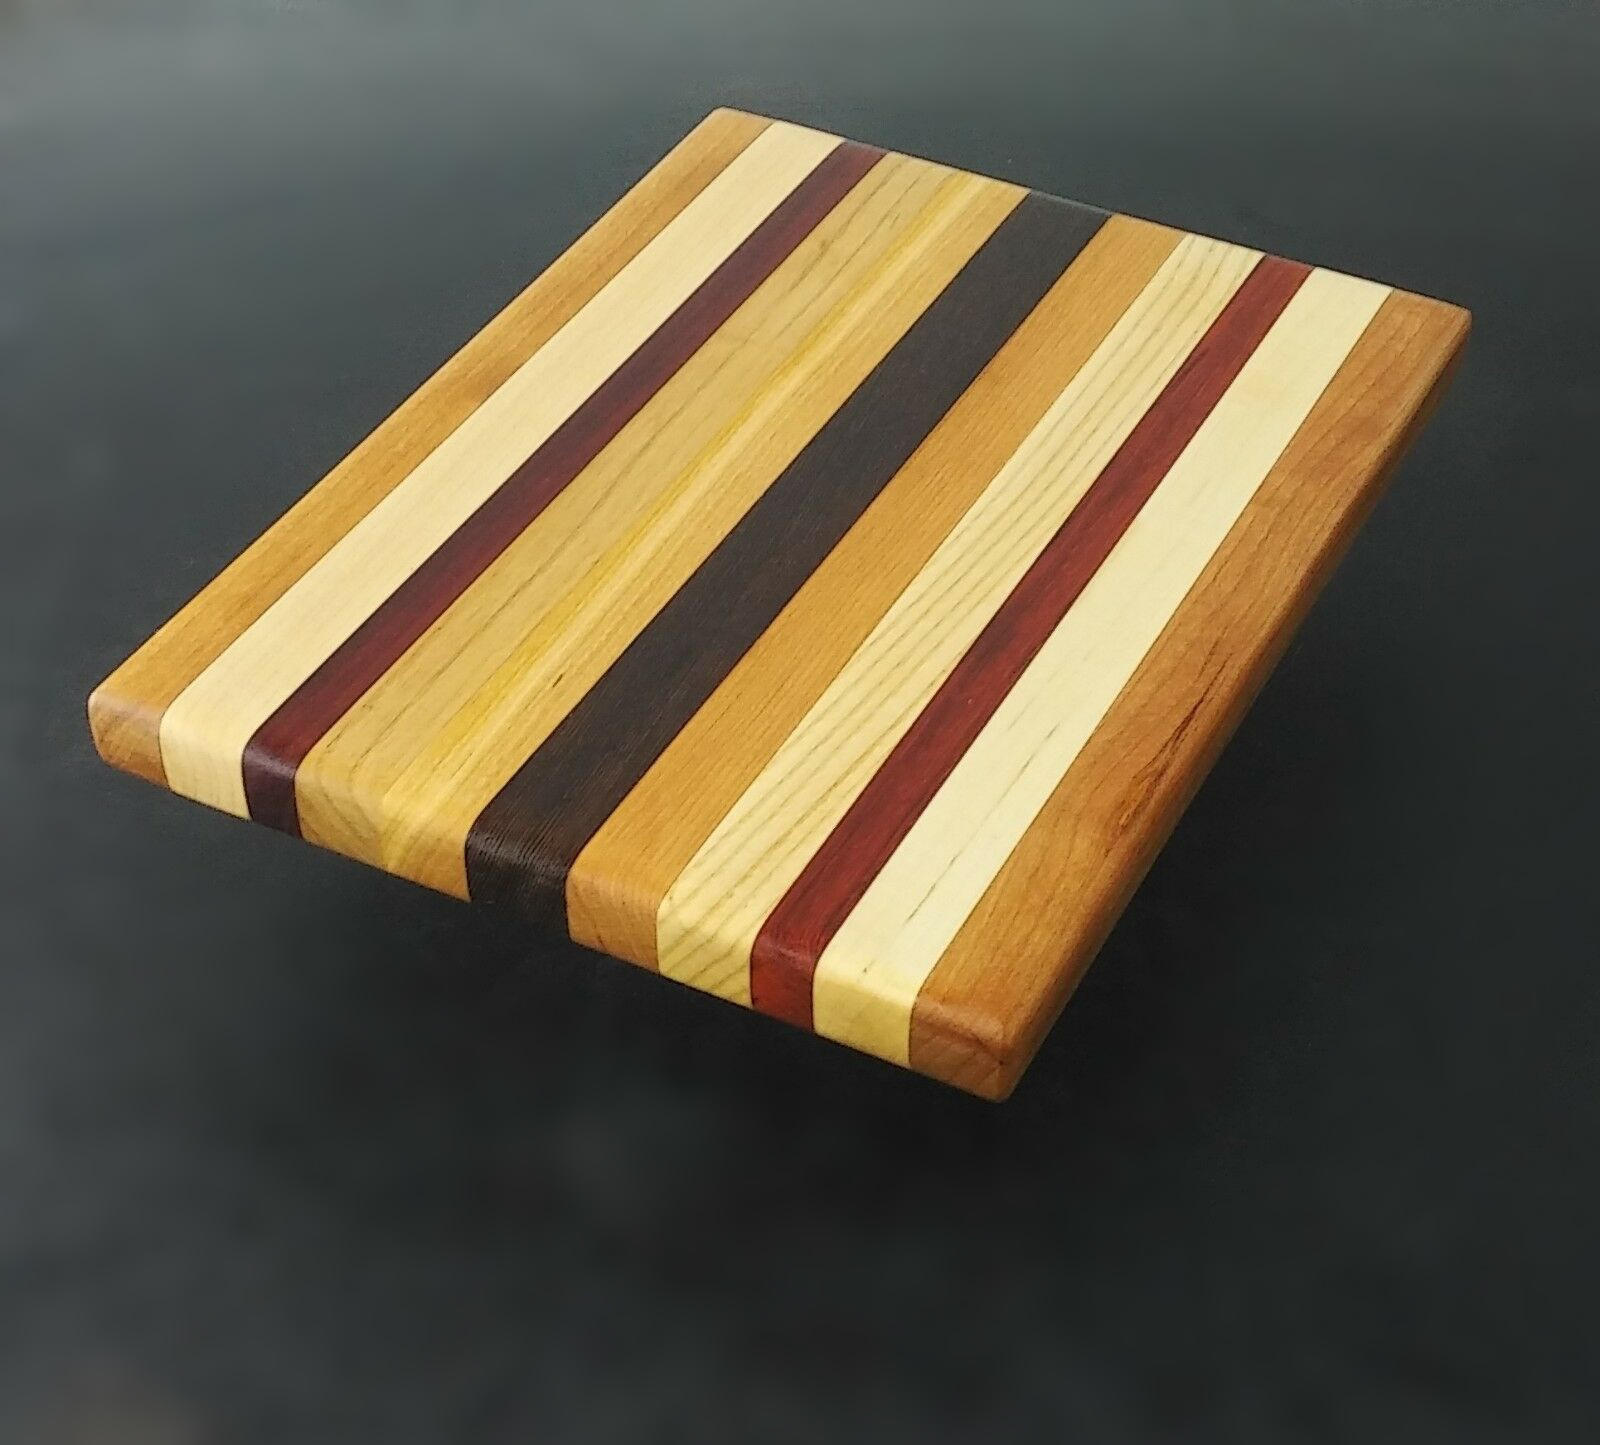 Cutting Board 8.5 x 10 x ¾ padauk accents image 1